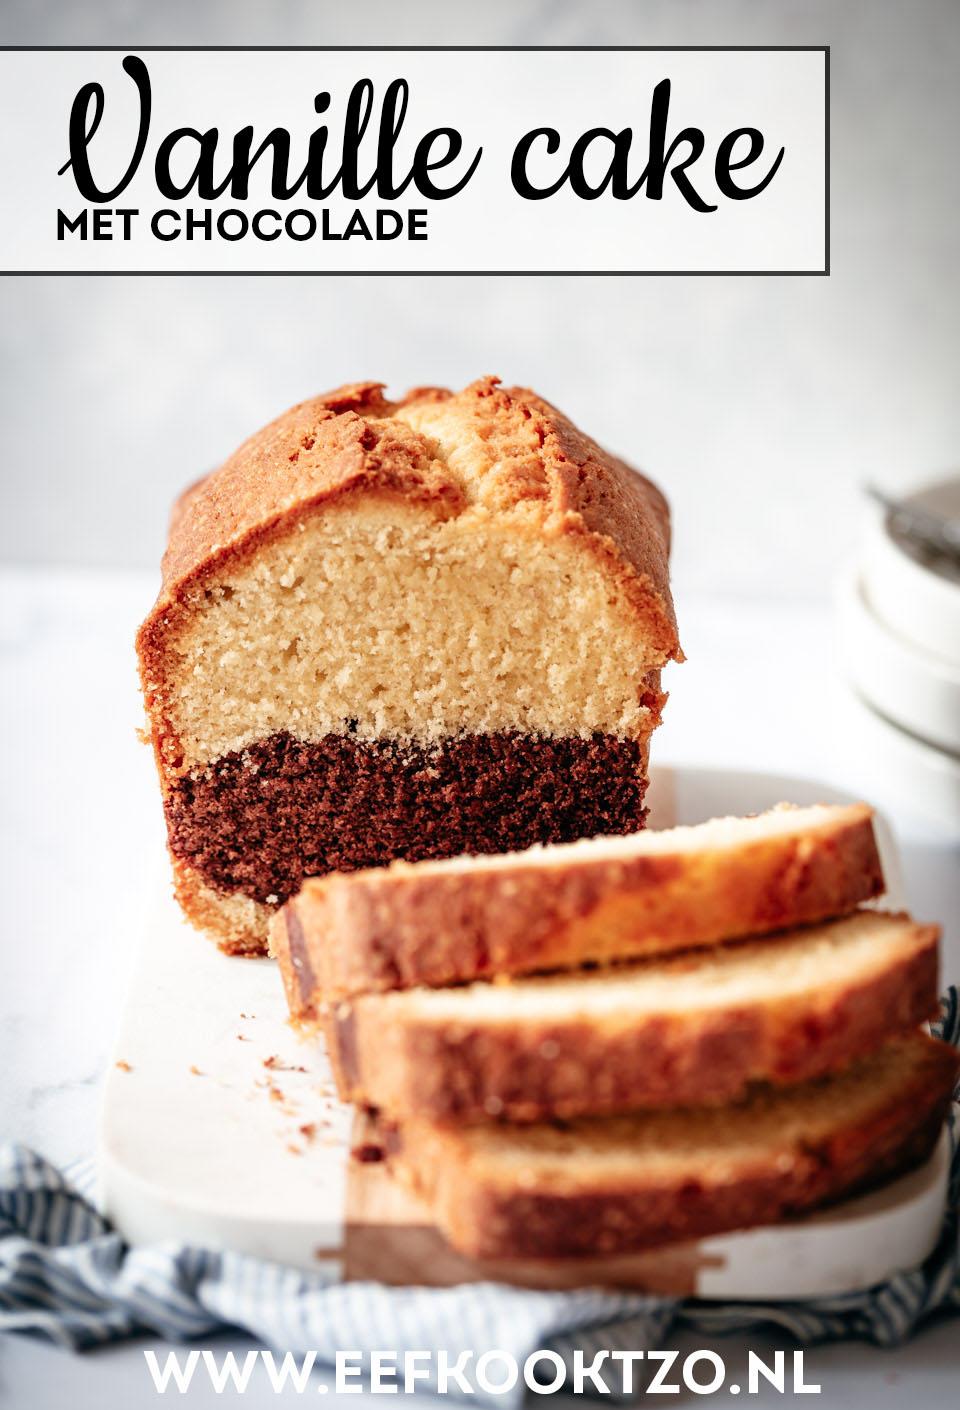 Vanille cake met chocolade Pinterest Collage